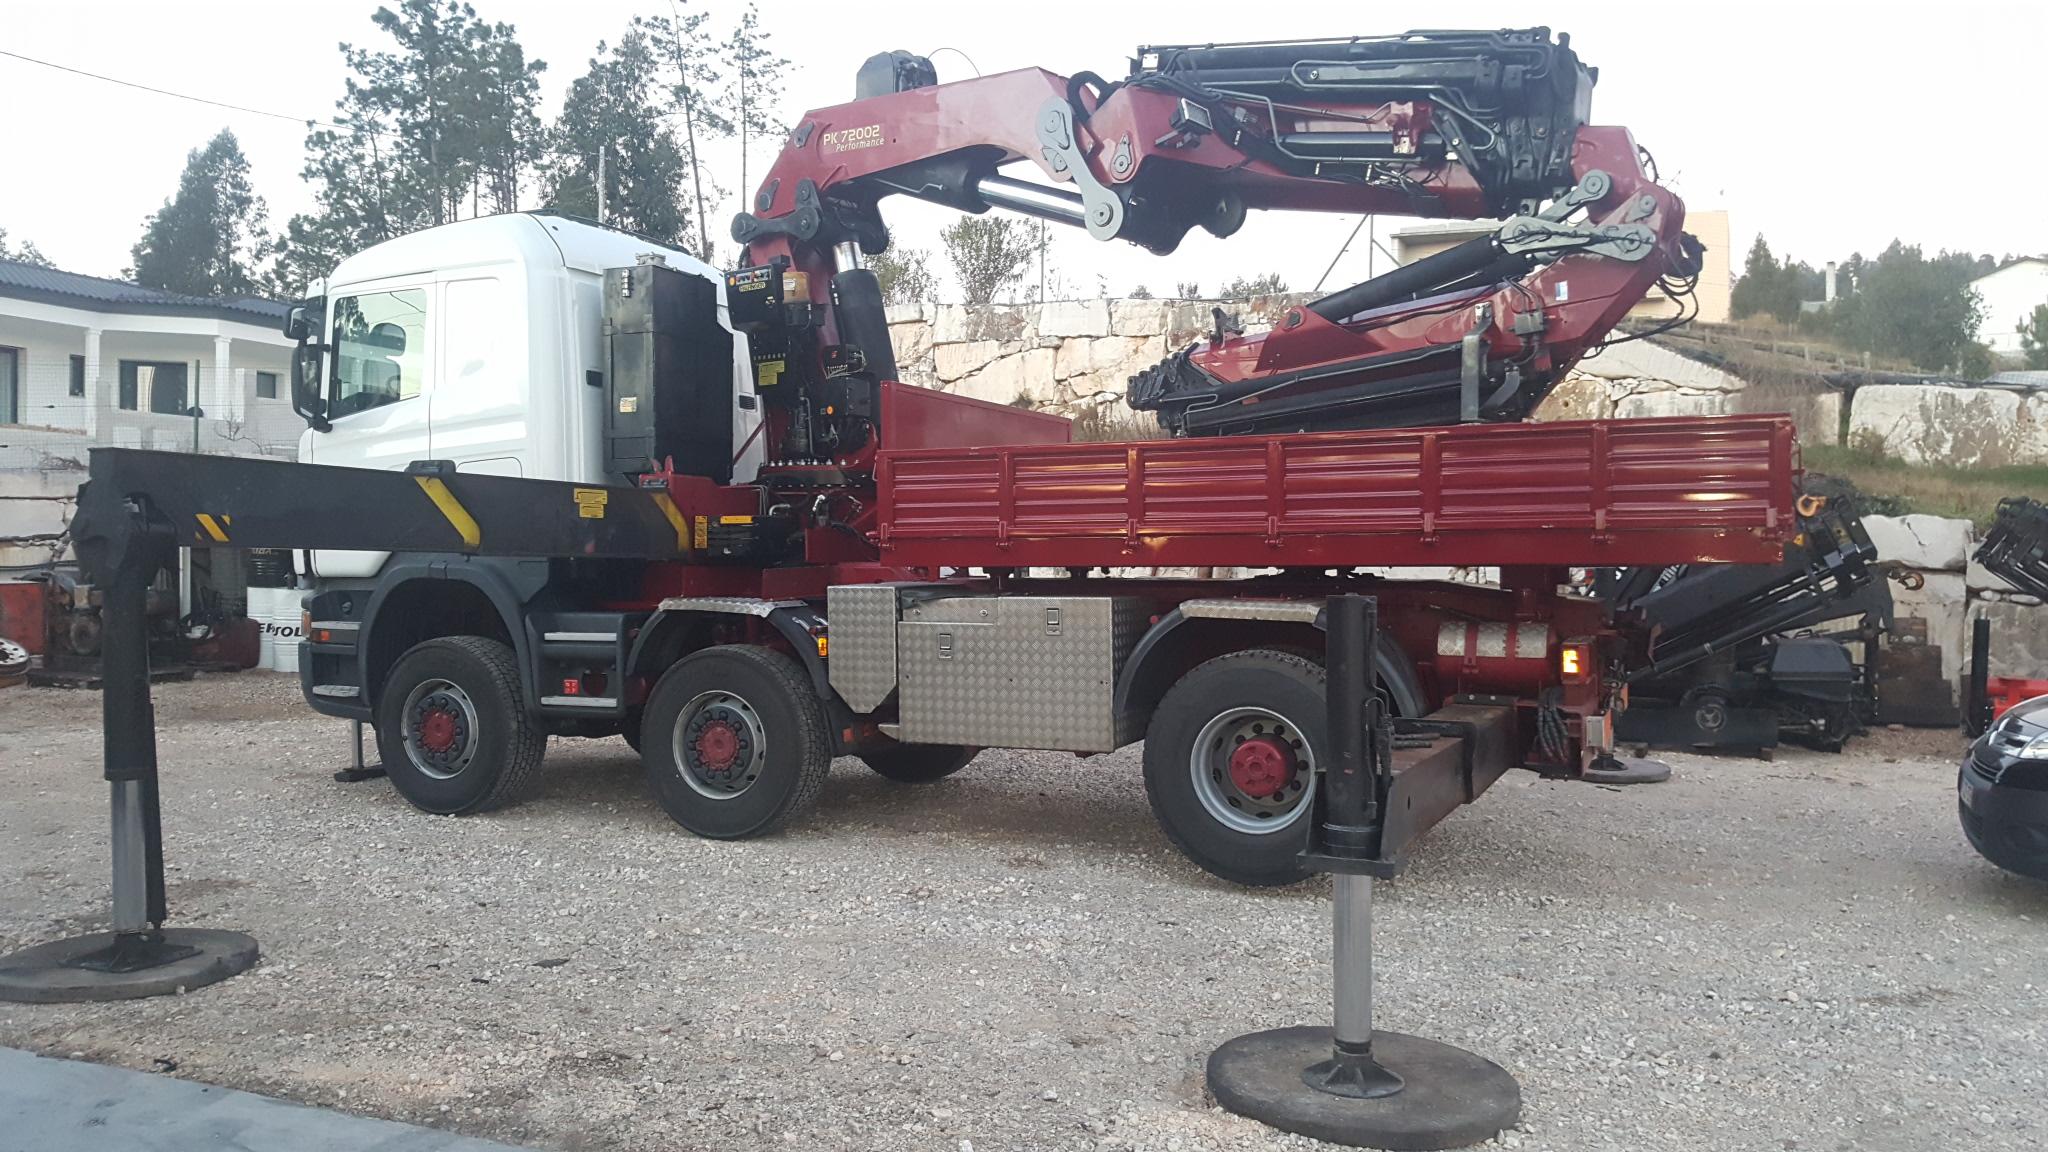 Scania + PK72002